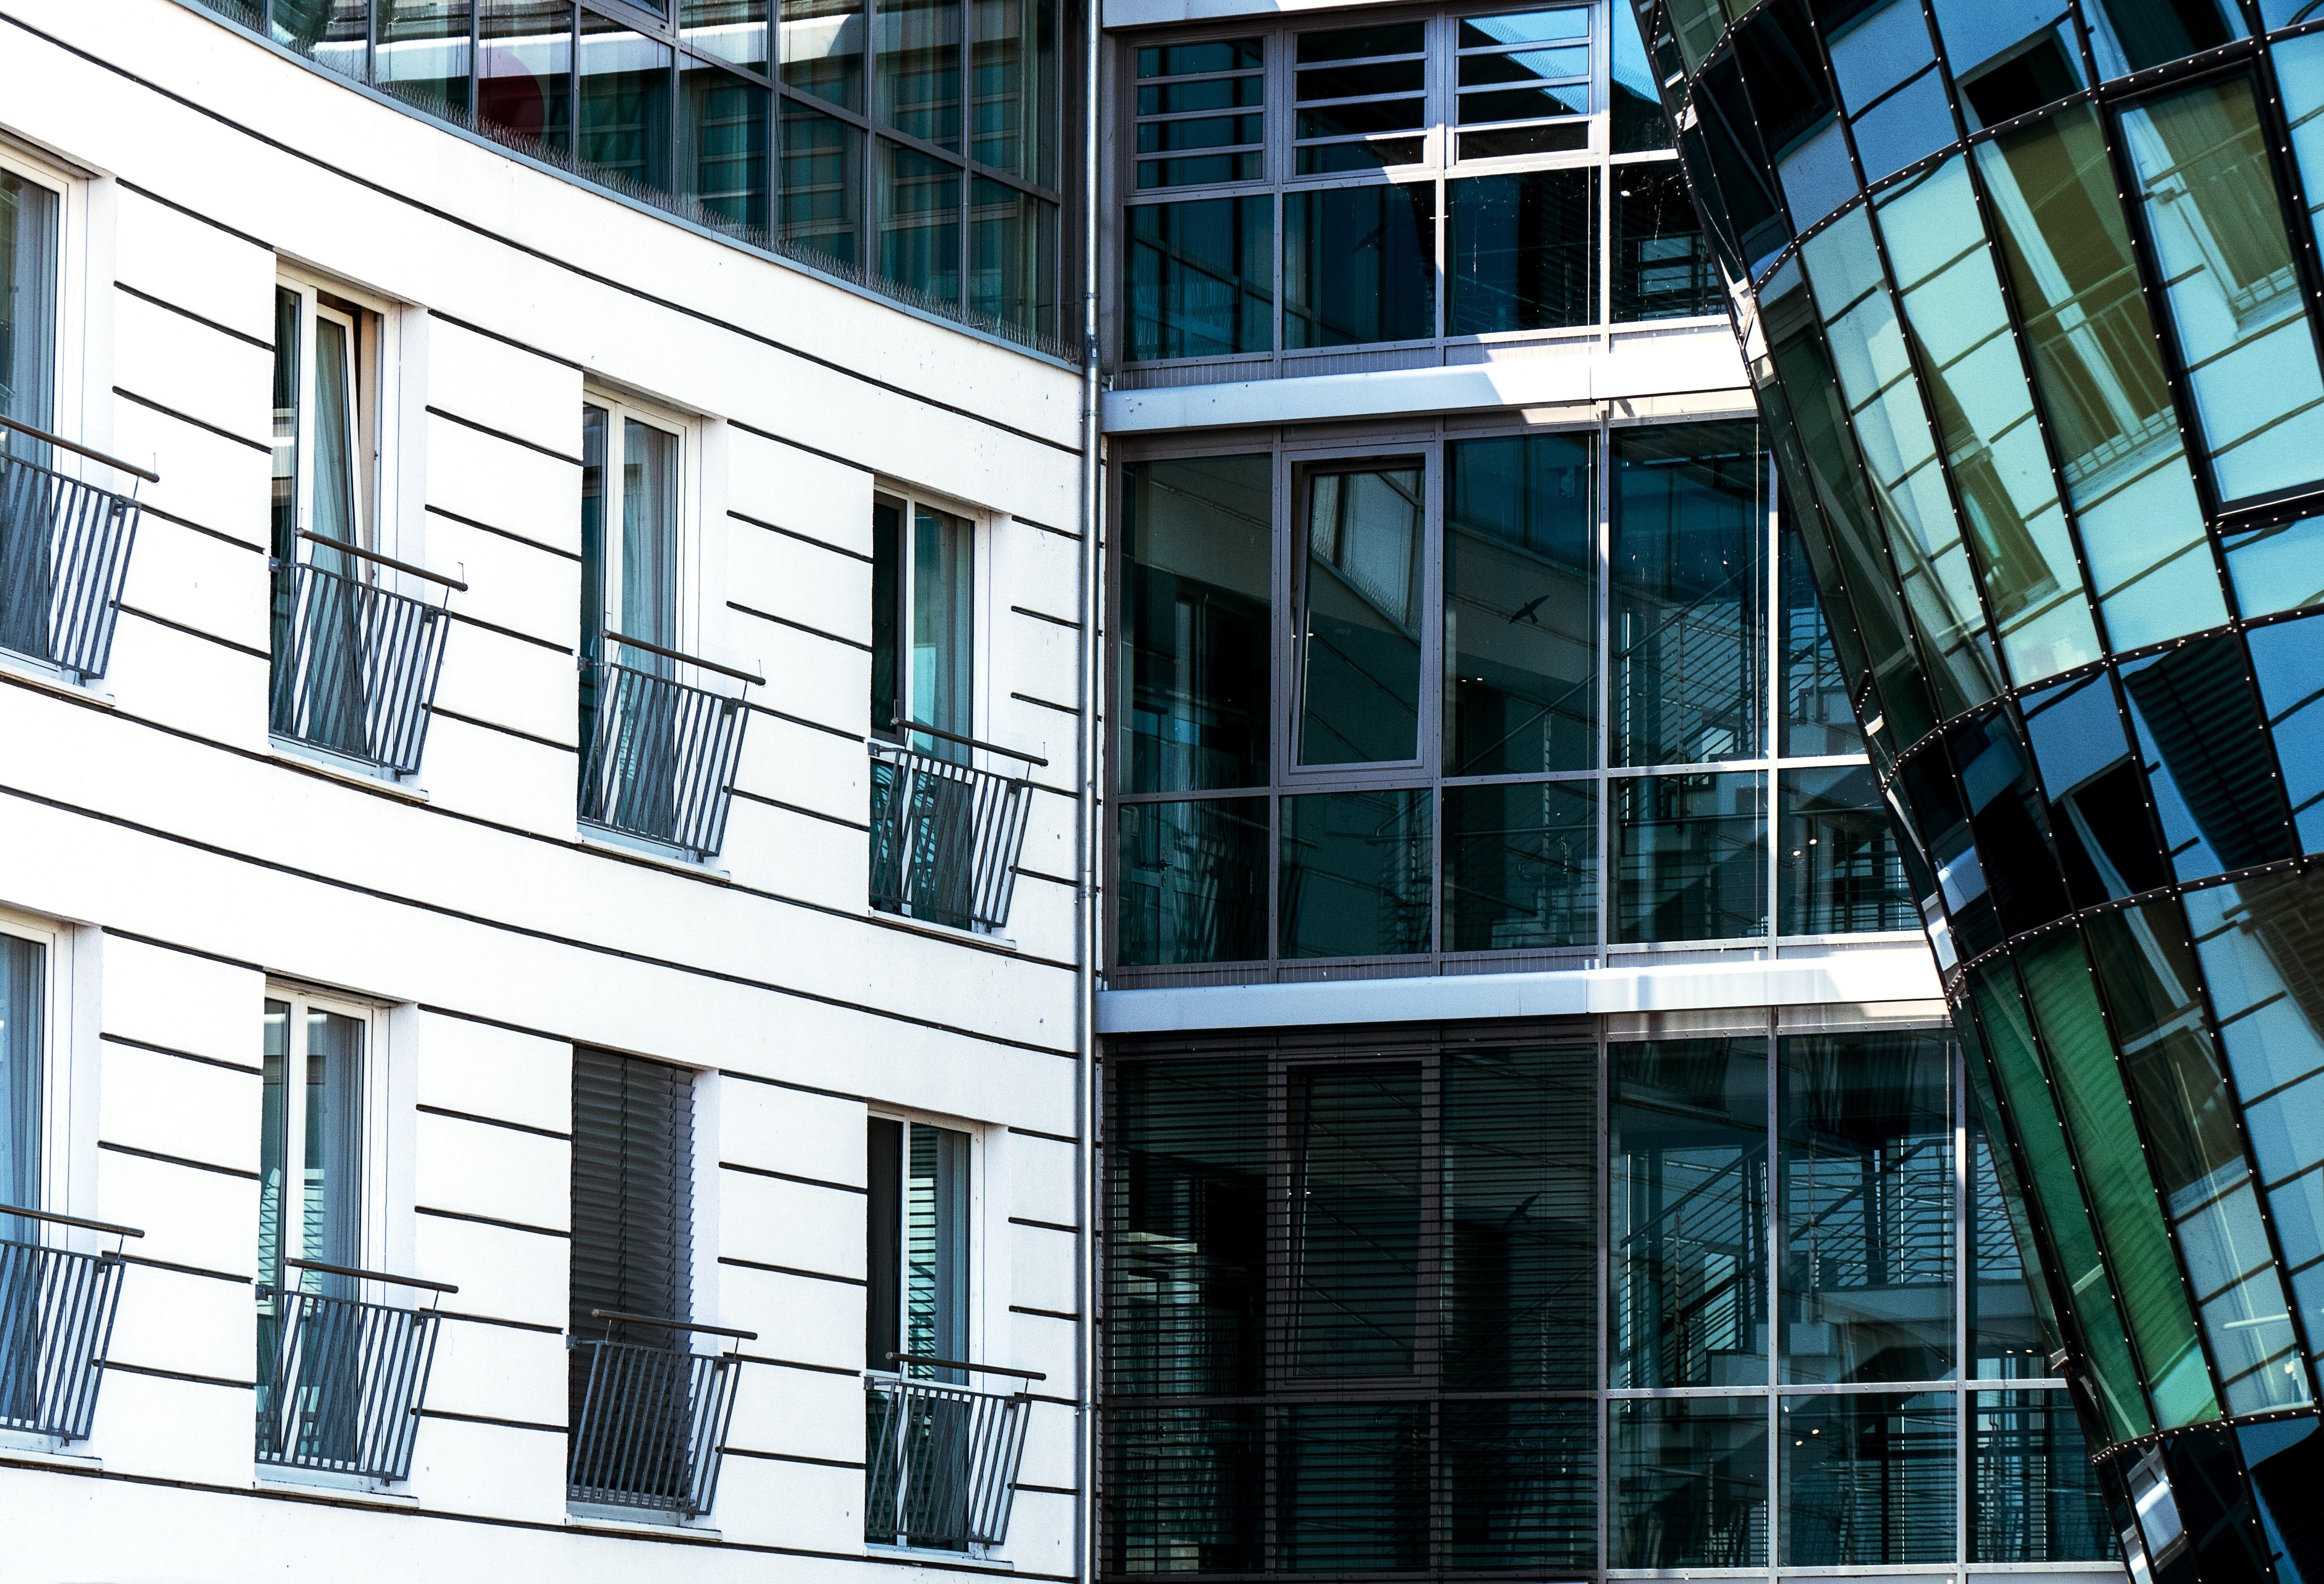 Fotos gratis arquitectura ventana rascacielos fachada for Casa moderna gratis